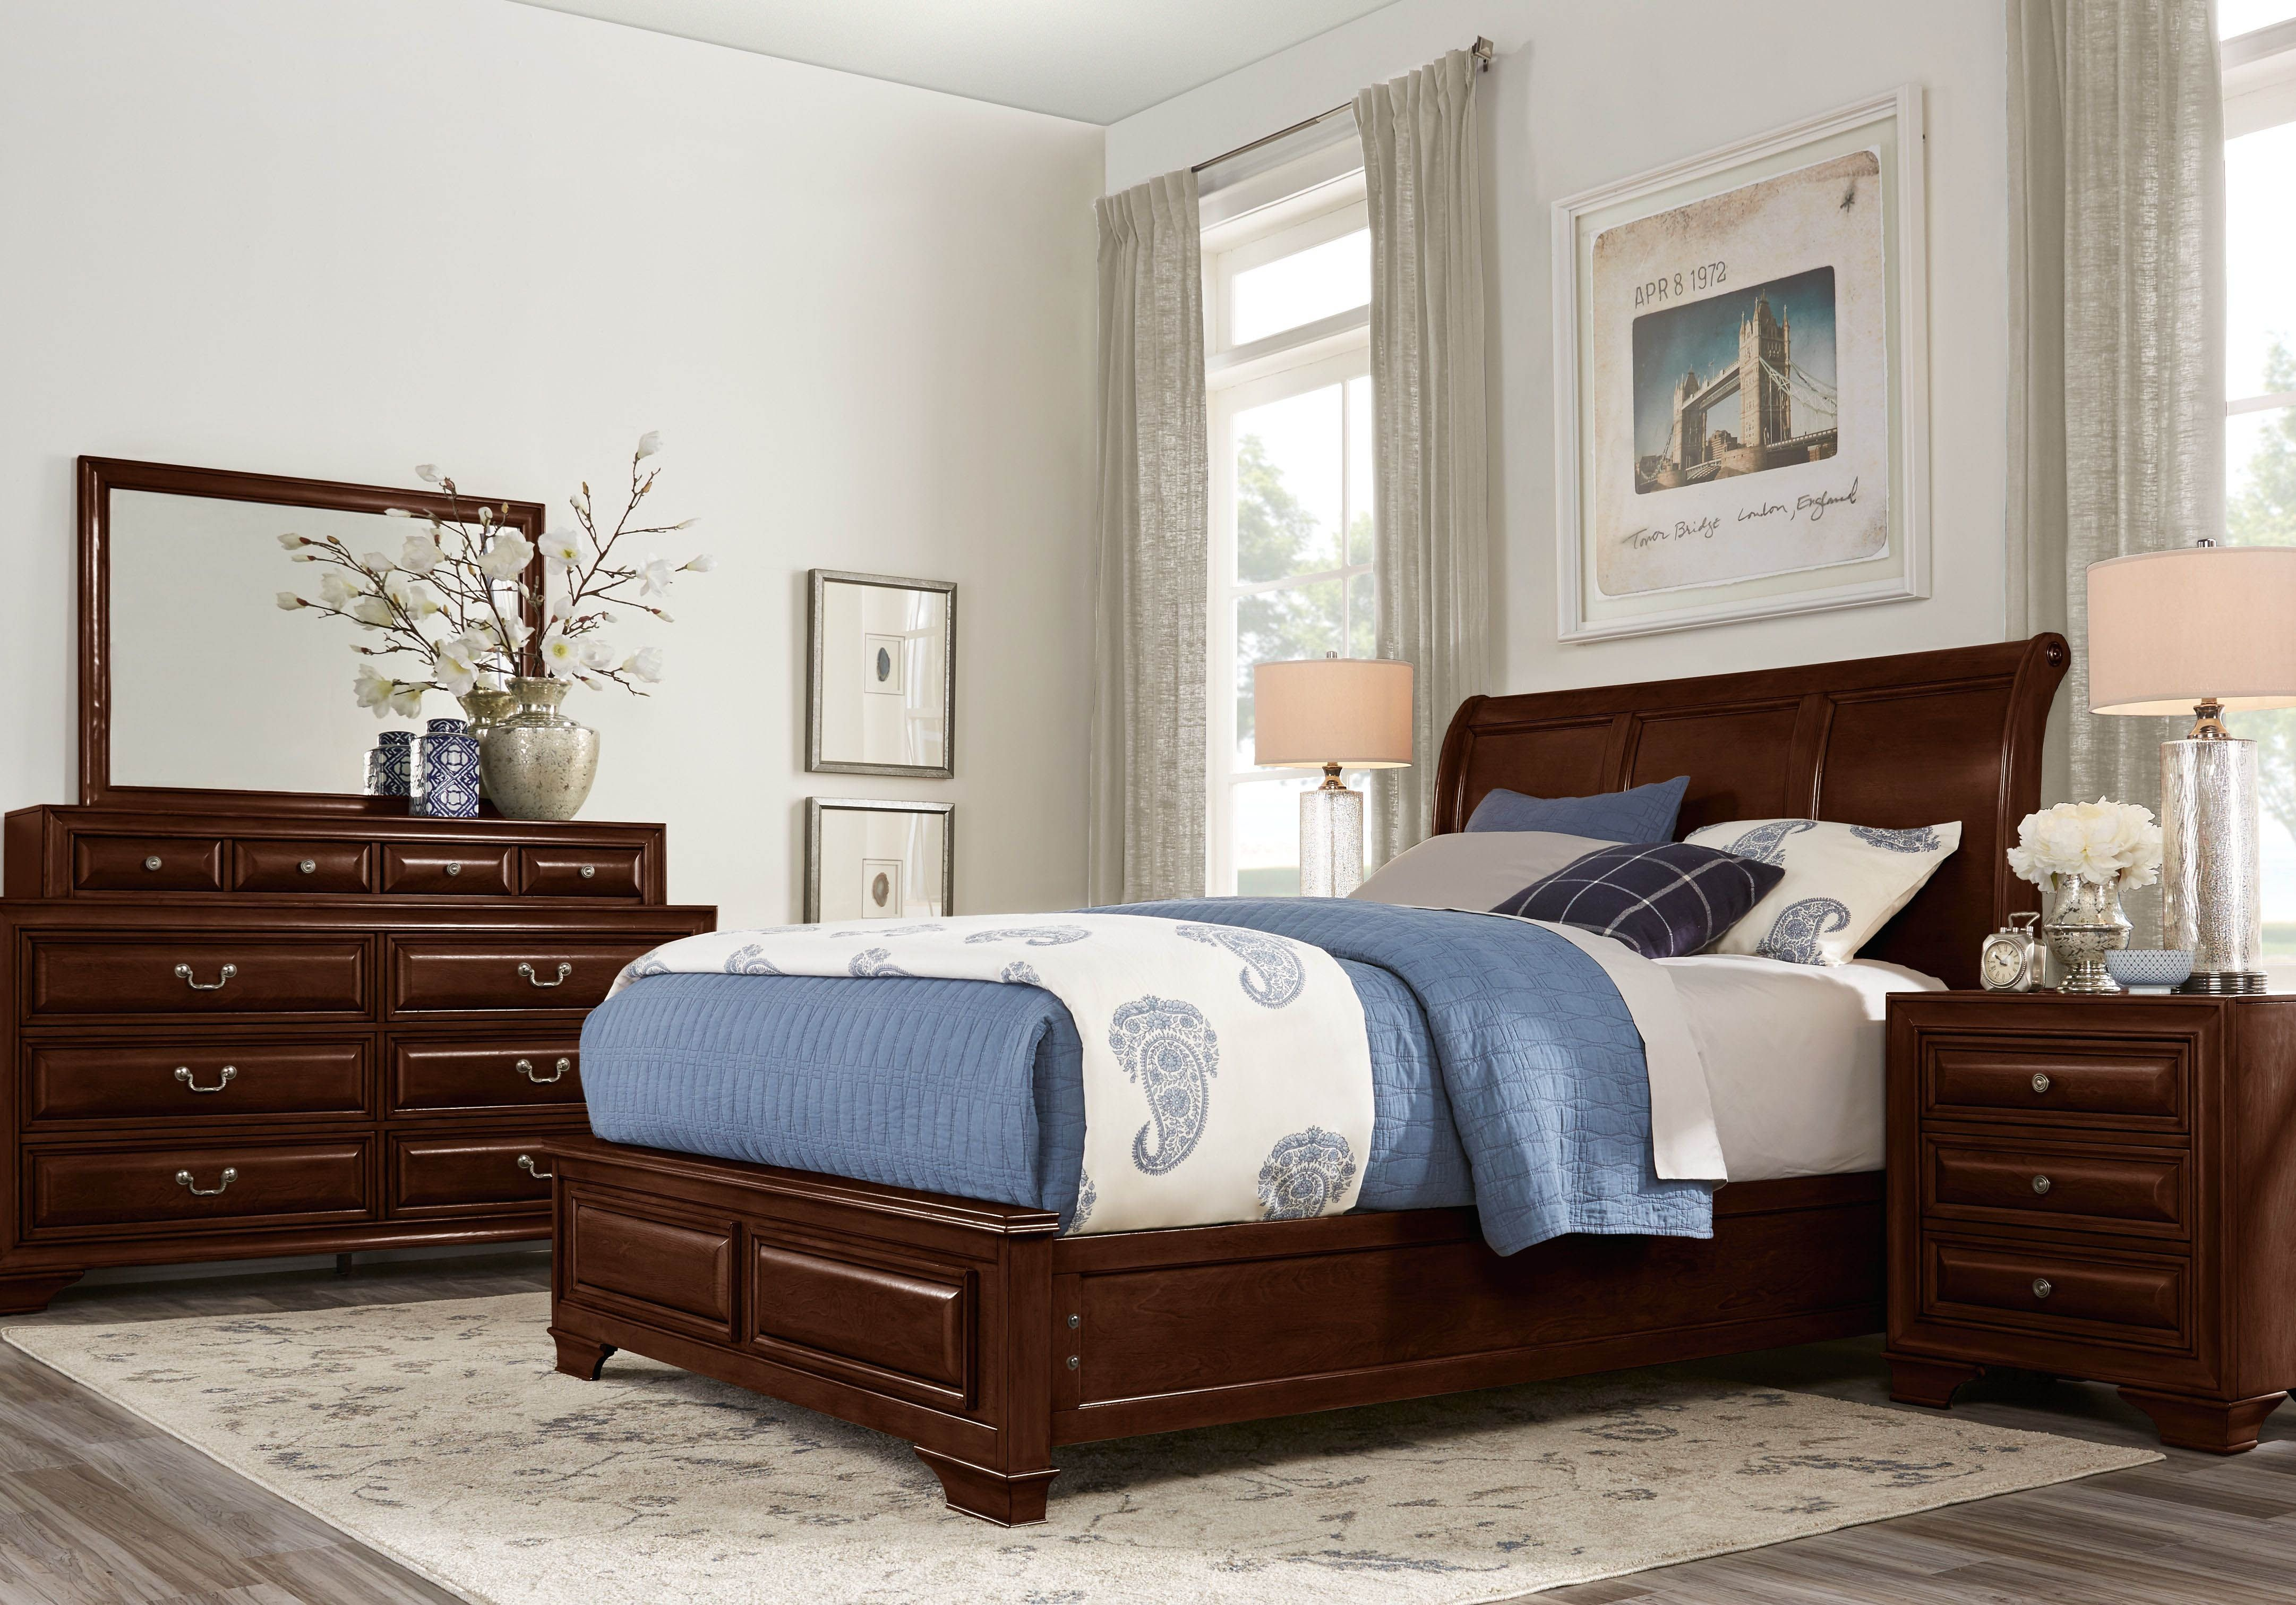 Master Bedroom Decorating Ideas Modern Bedroom Sets